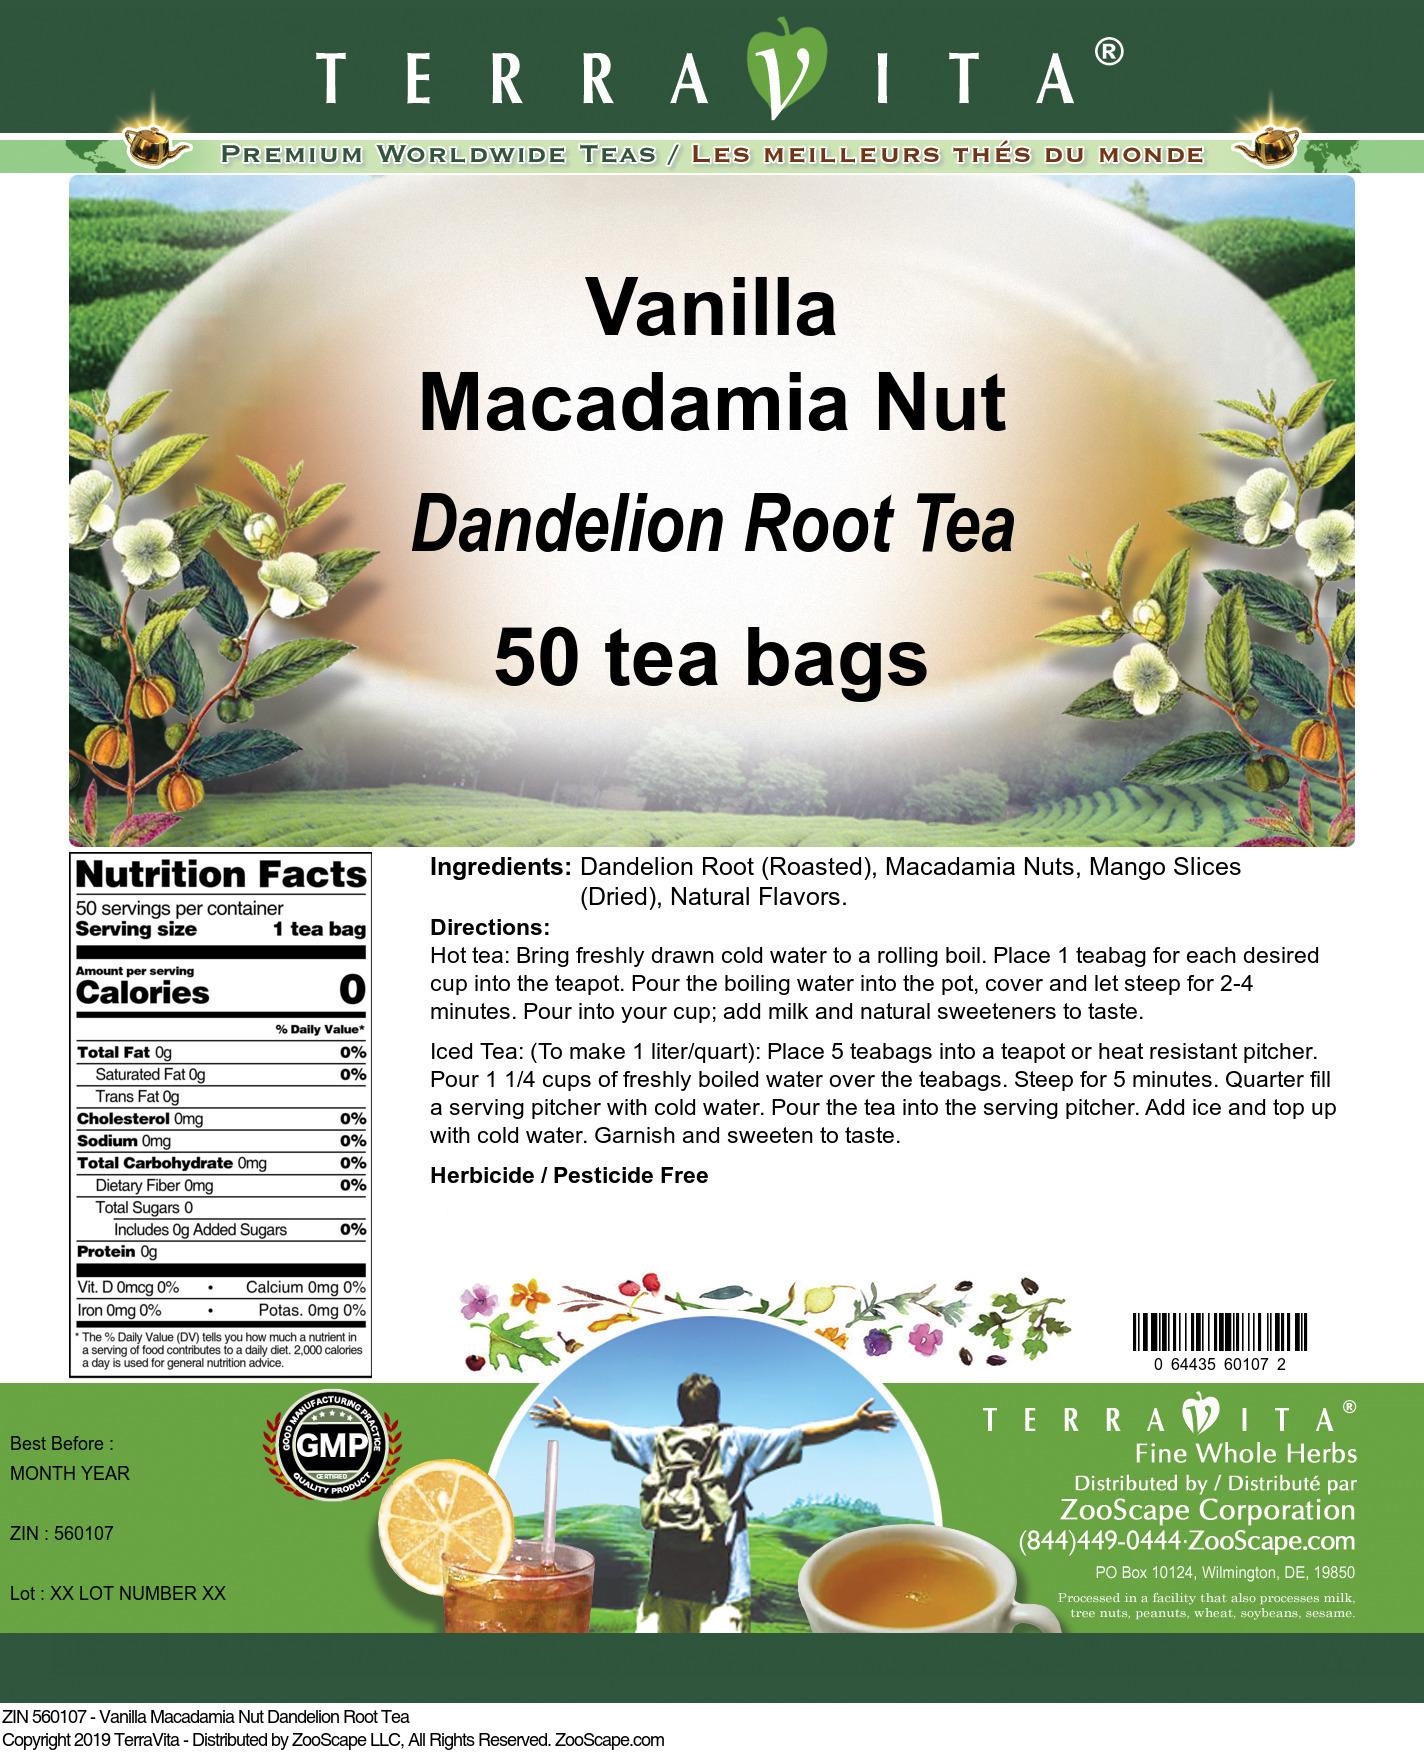 Vanilla Macadamia Nut Dandelion Root Tea